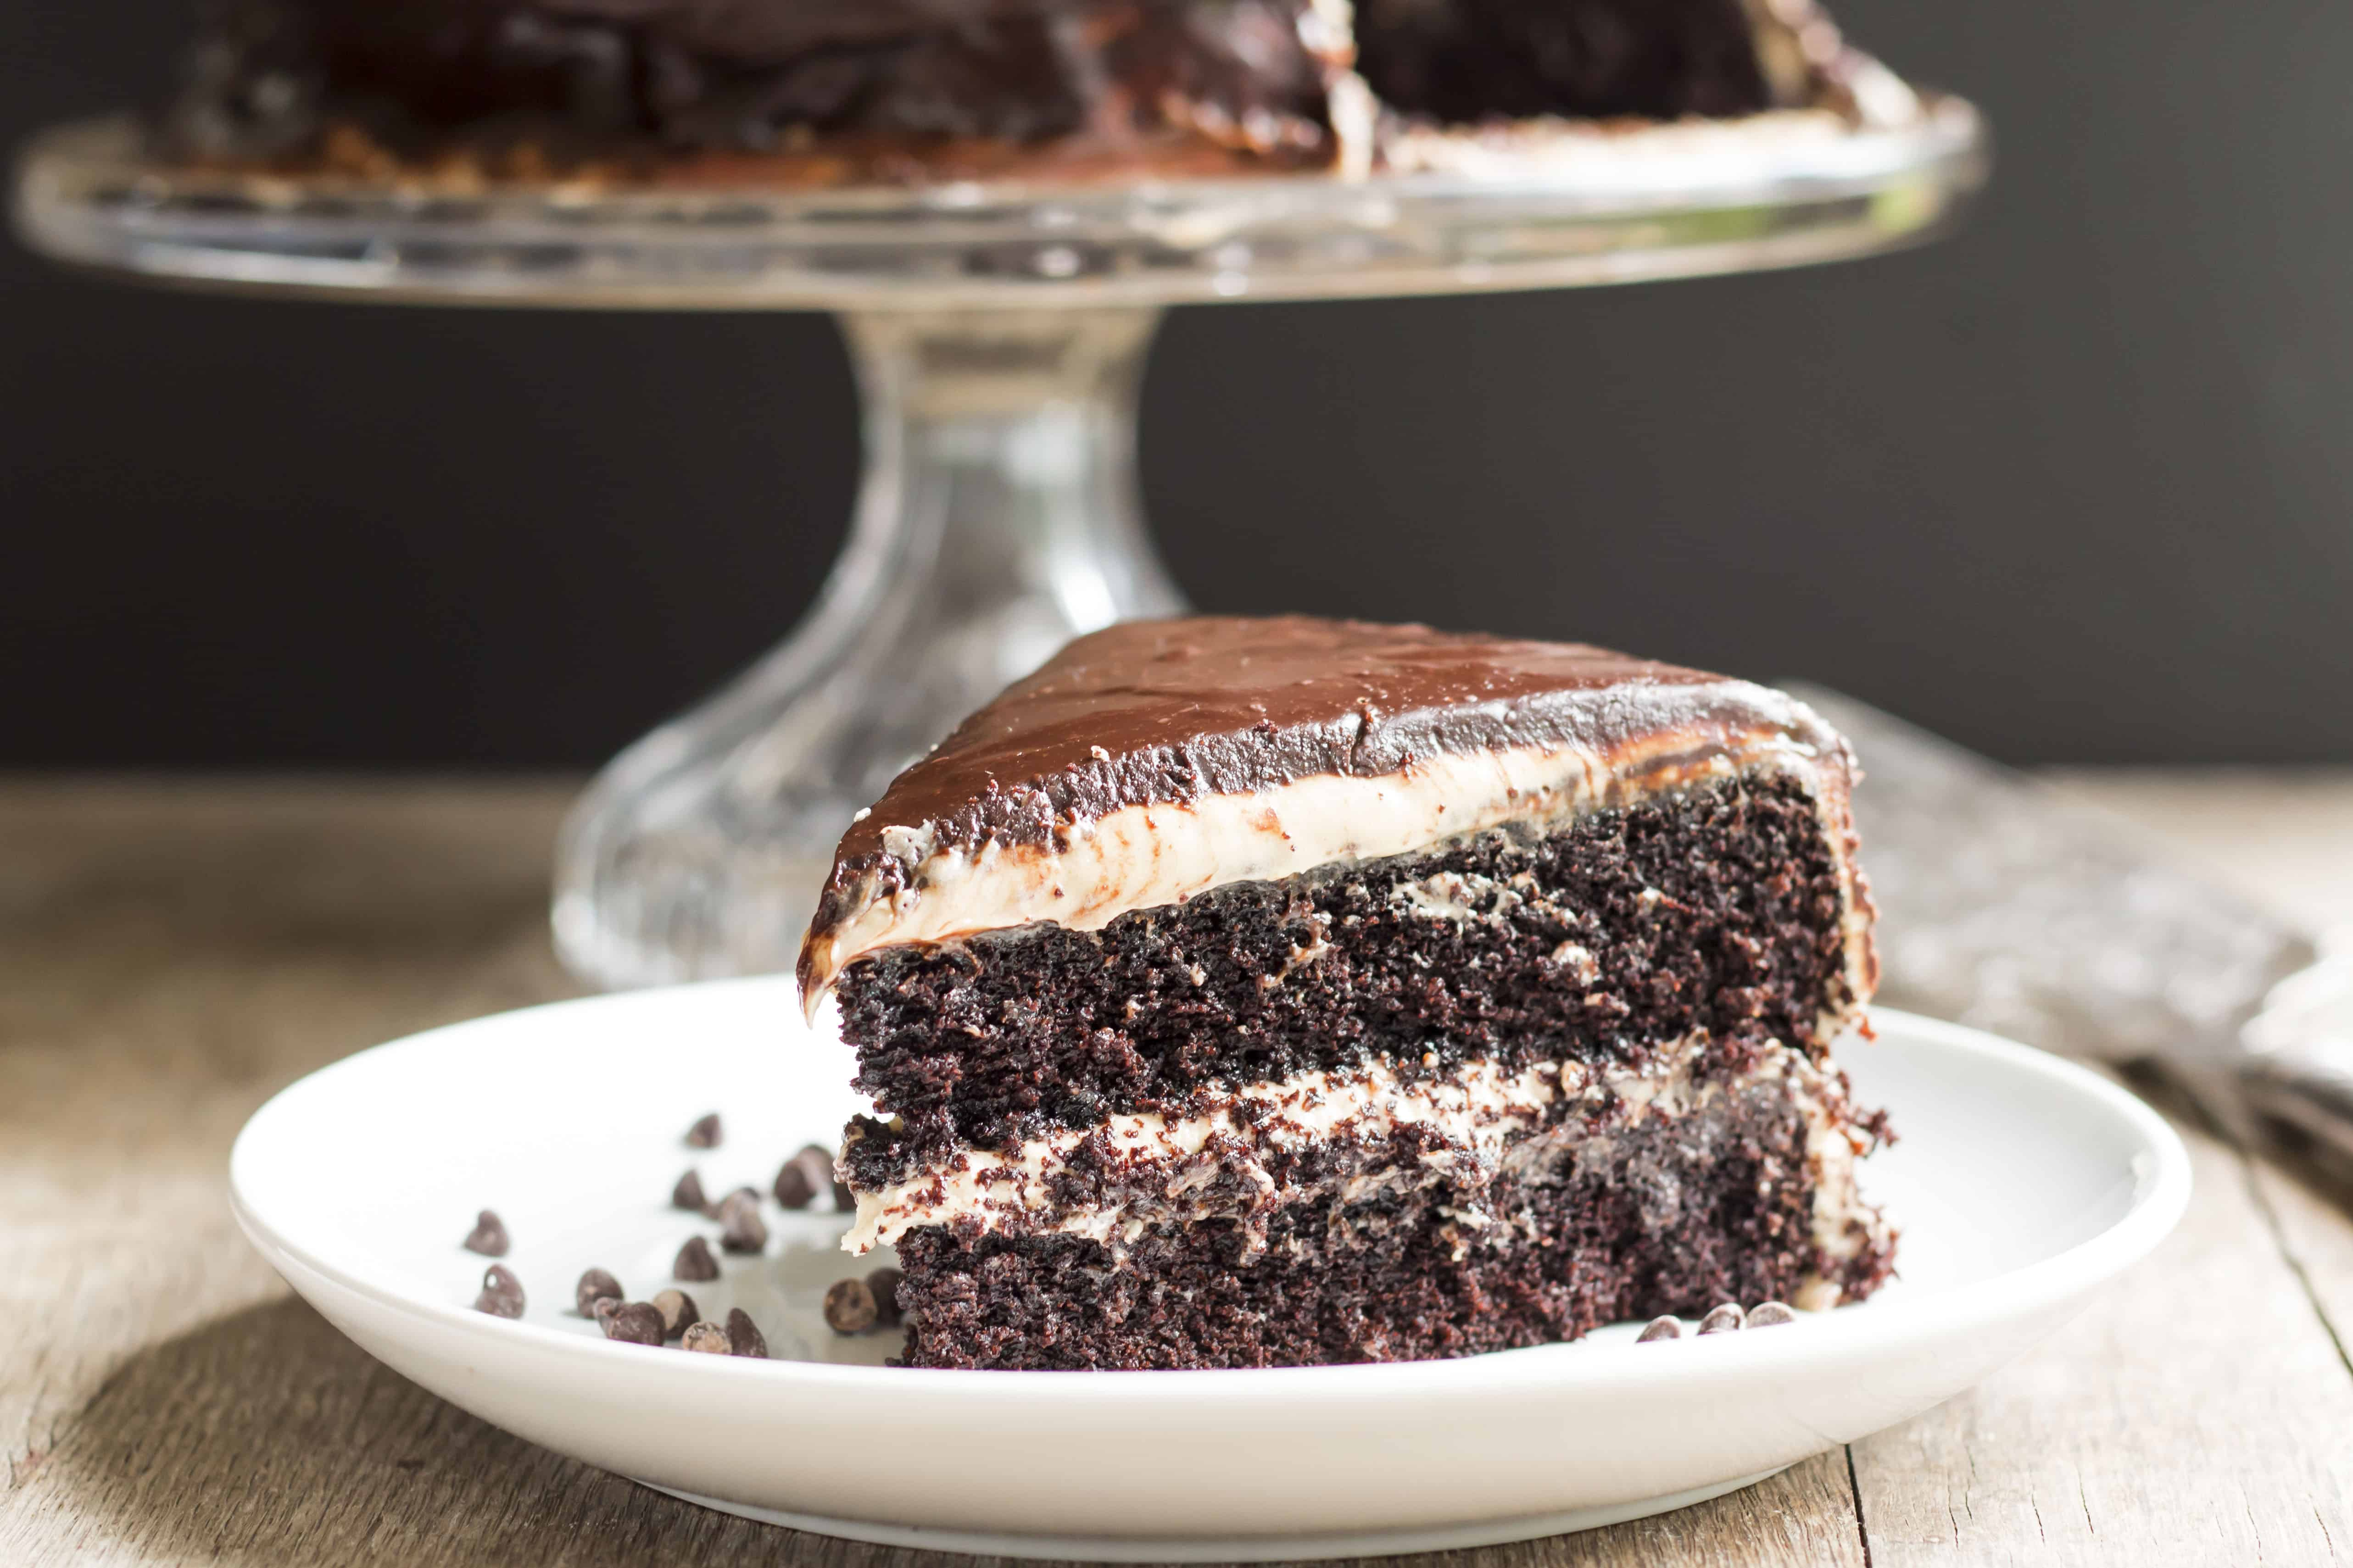 Dark Chocolate and Peanut Butter Midnight Cake | Gluten Free with L.B.